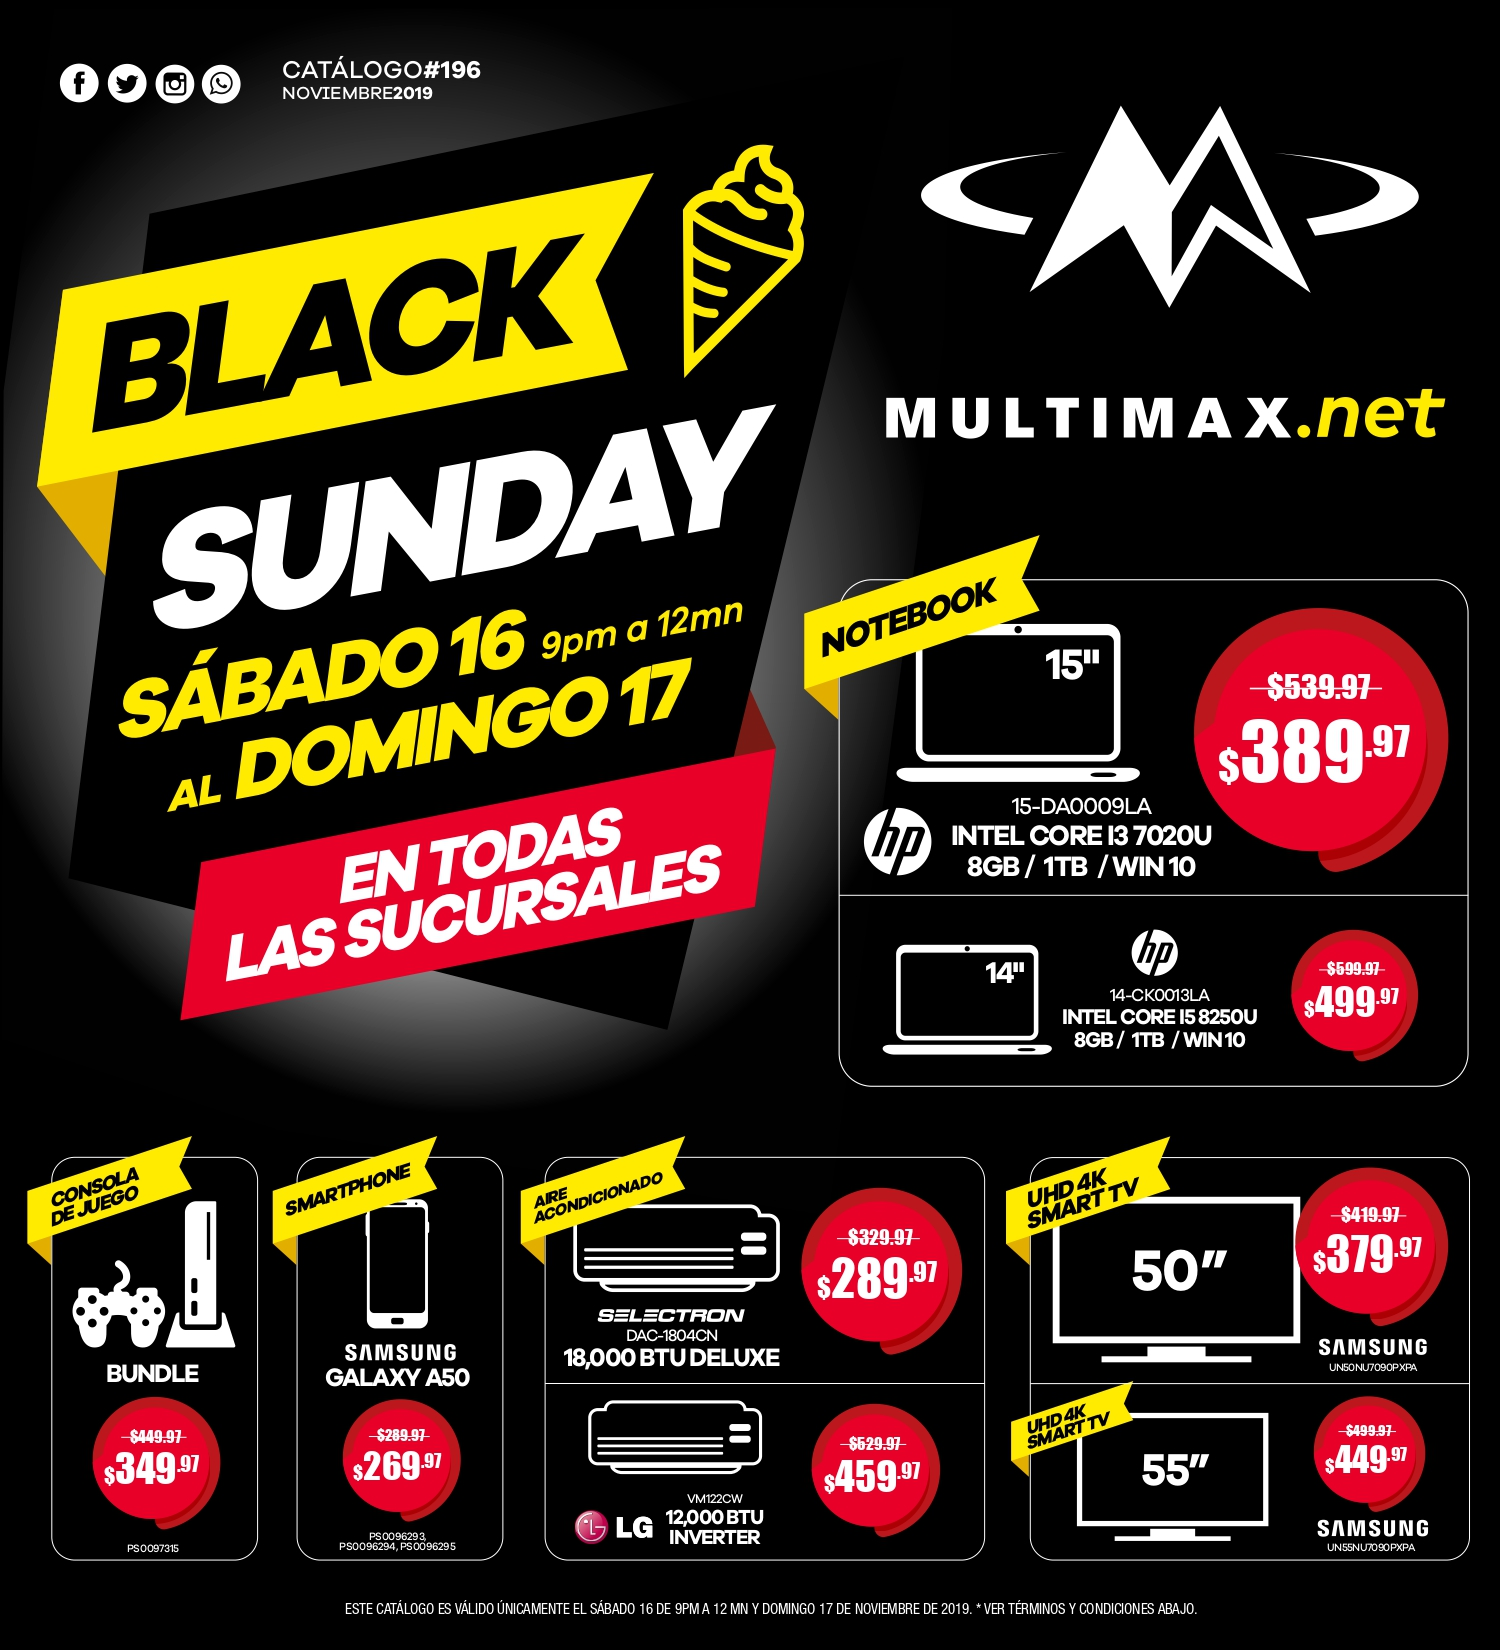 Catalogo Multimax Black sunday 2019 p1